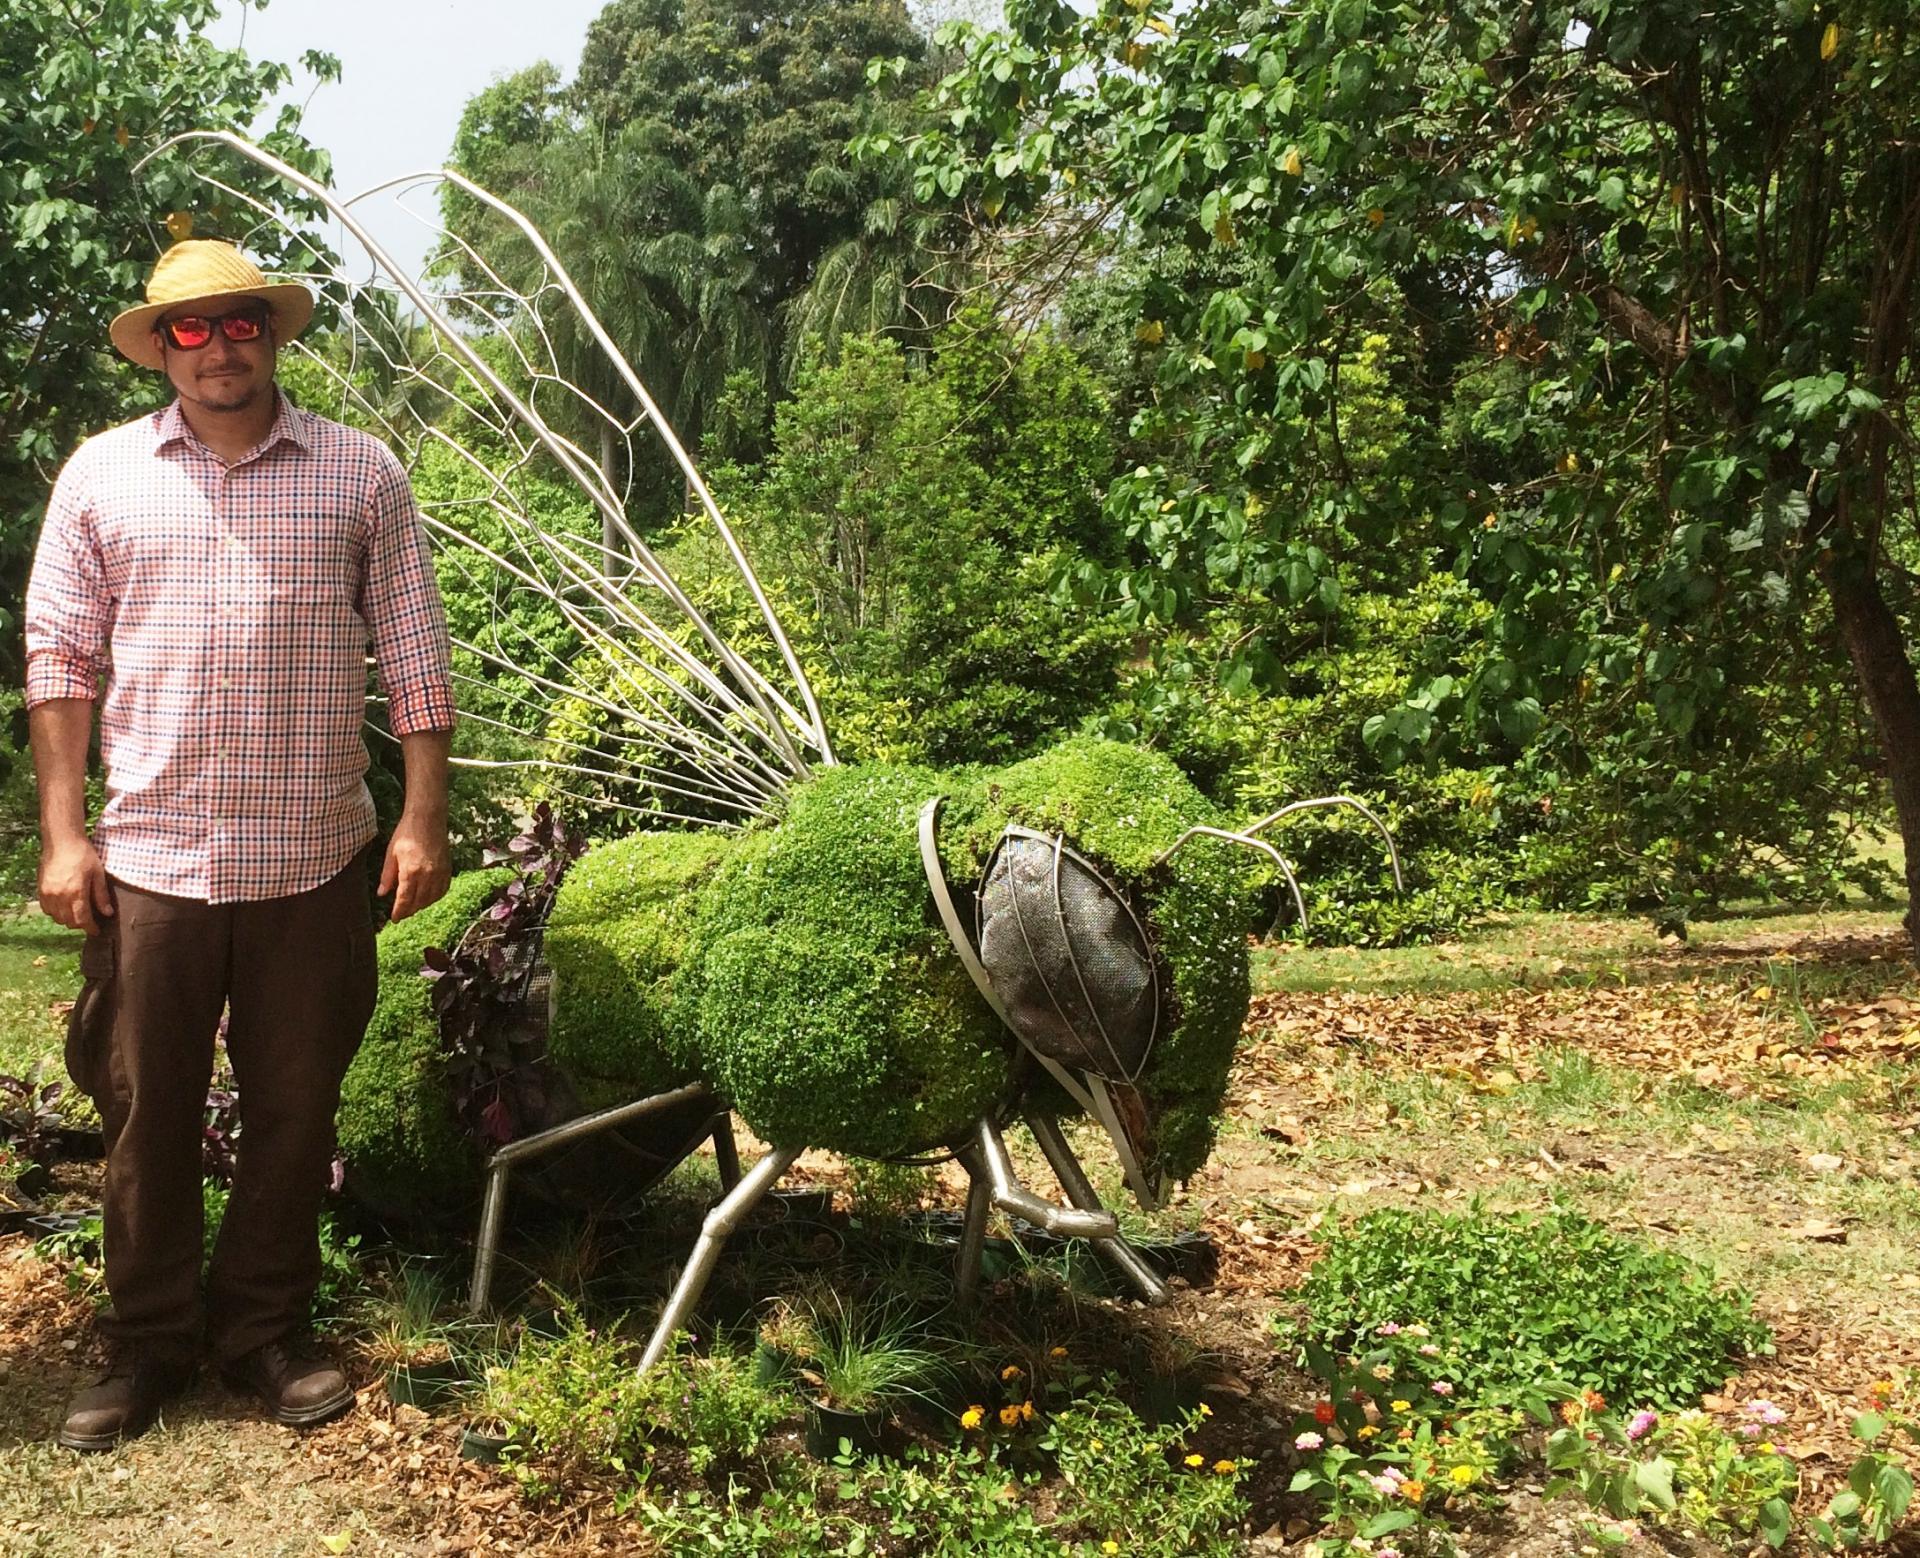 Marsh Christian Award 2018 Awarded To Christian Torres Santana American Public Gardens Association